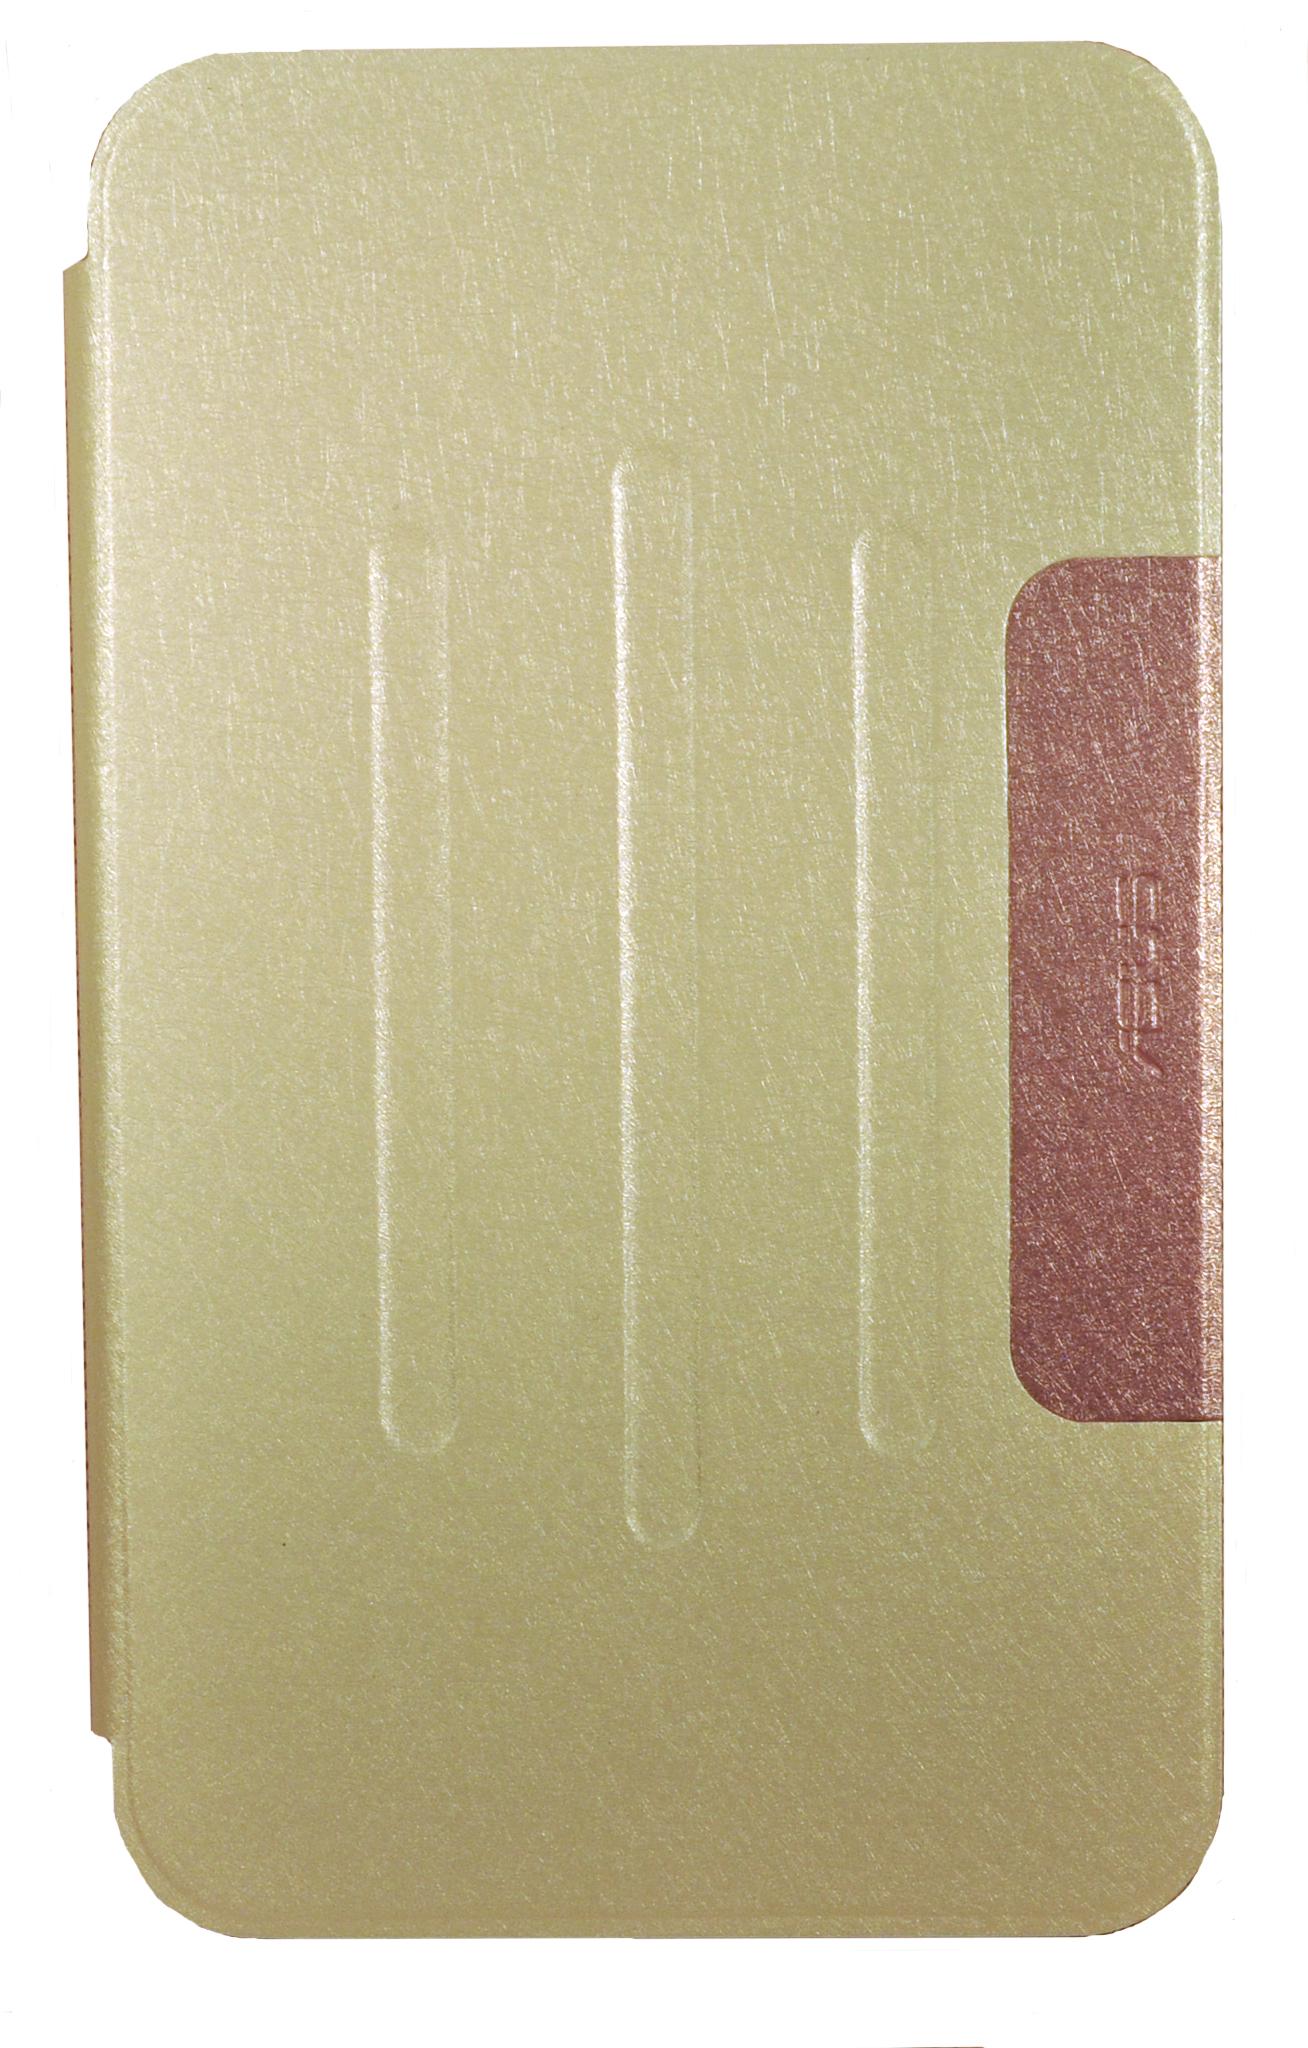 Чехол-книжка Book Cover для ASUS MeMO Pad 8 ME581CL золотистый 2000878020788